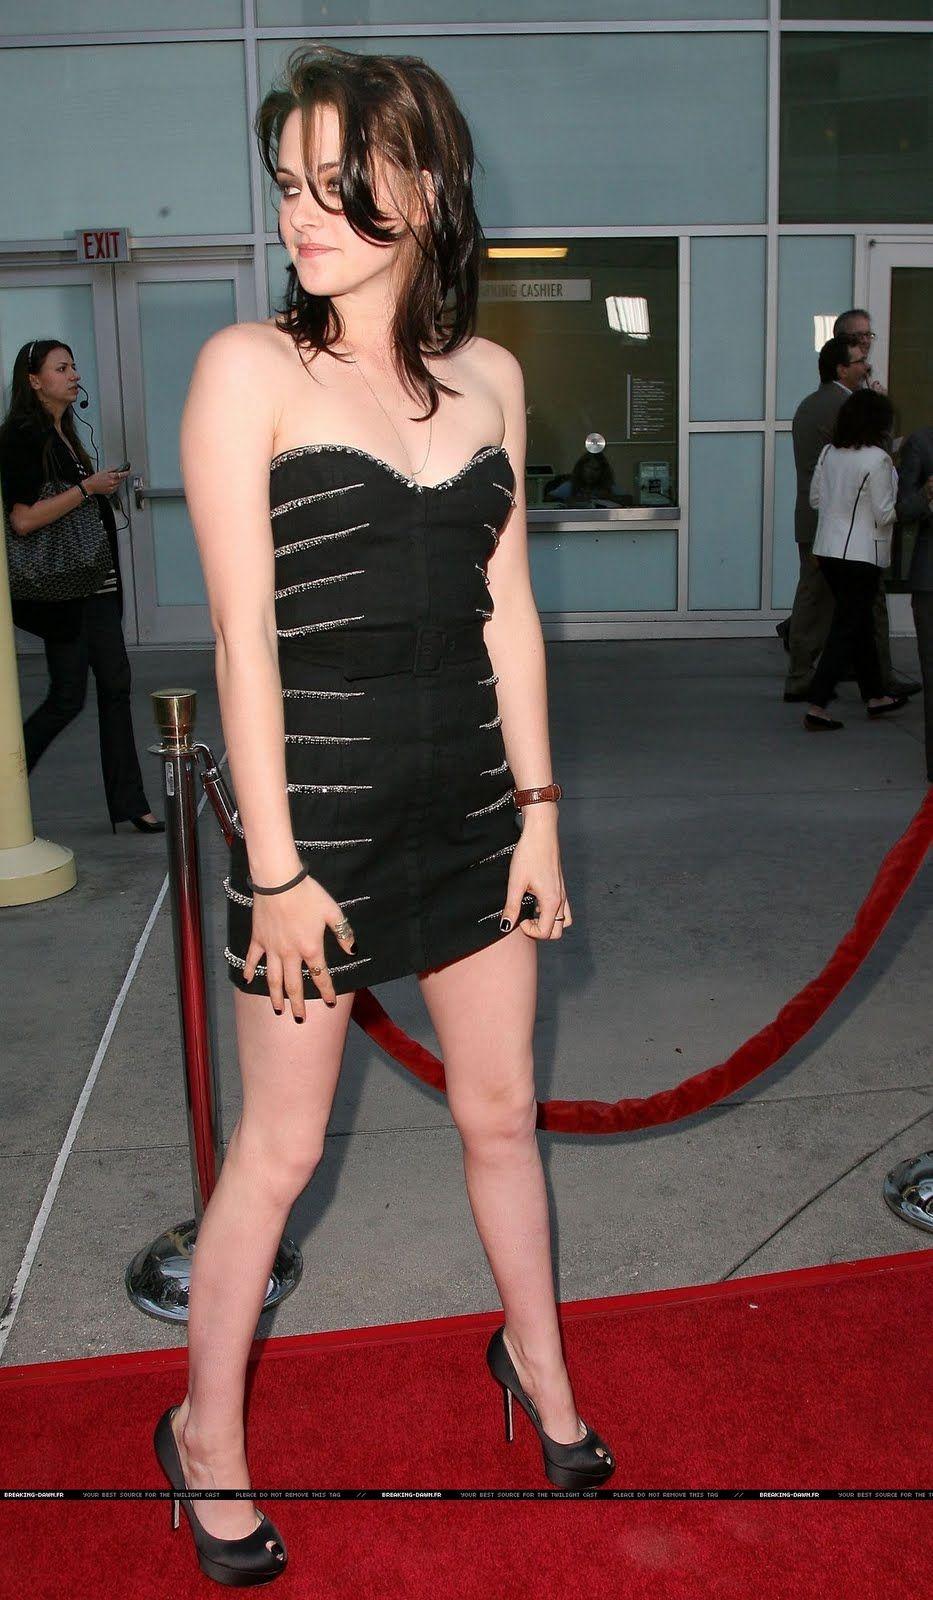 Kristen Stewart Kristen stewart, Kirsten stewart